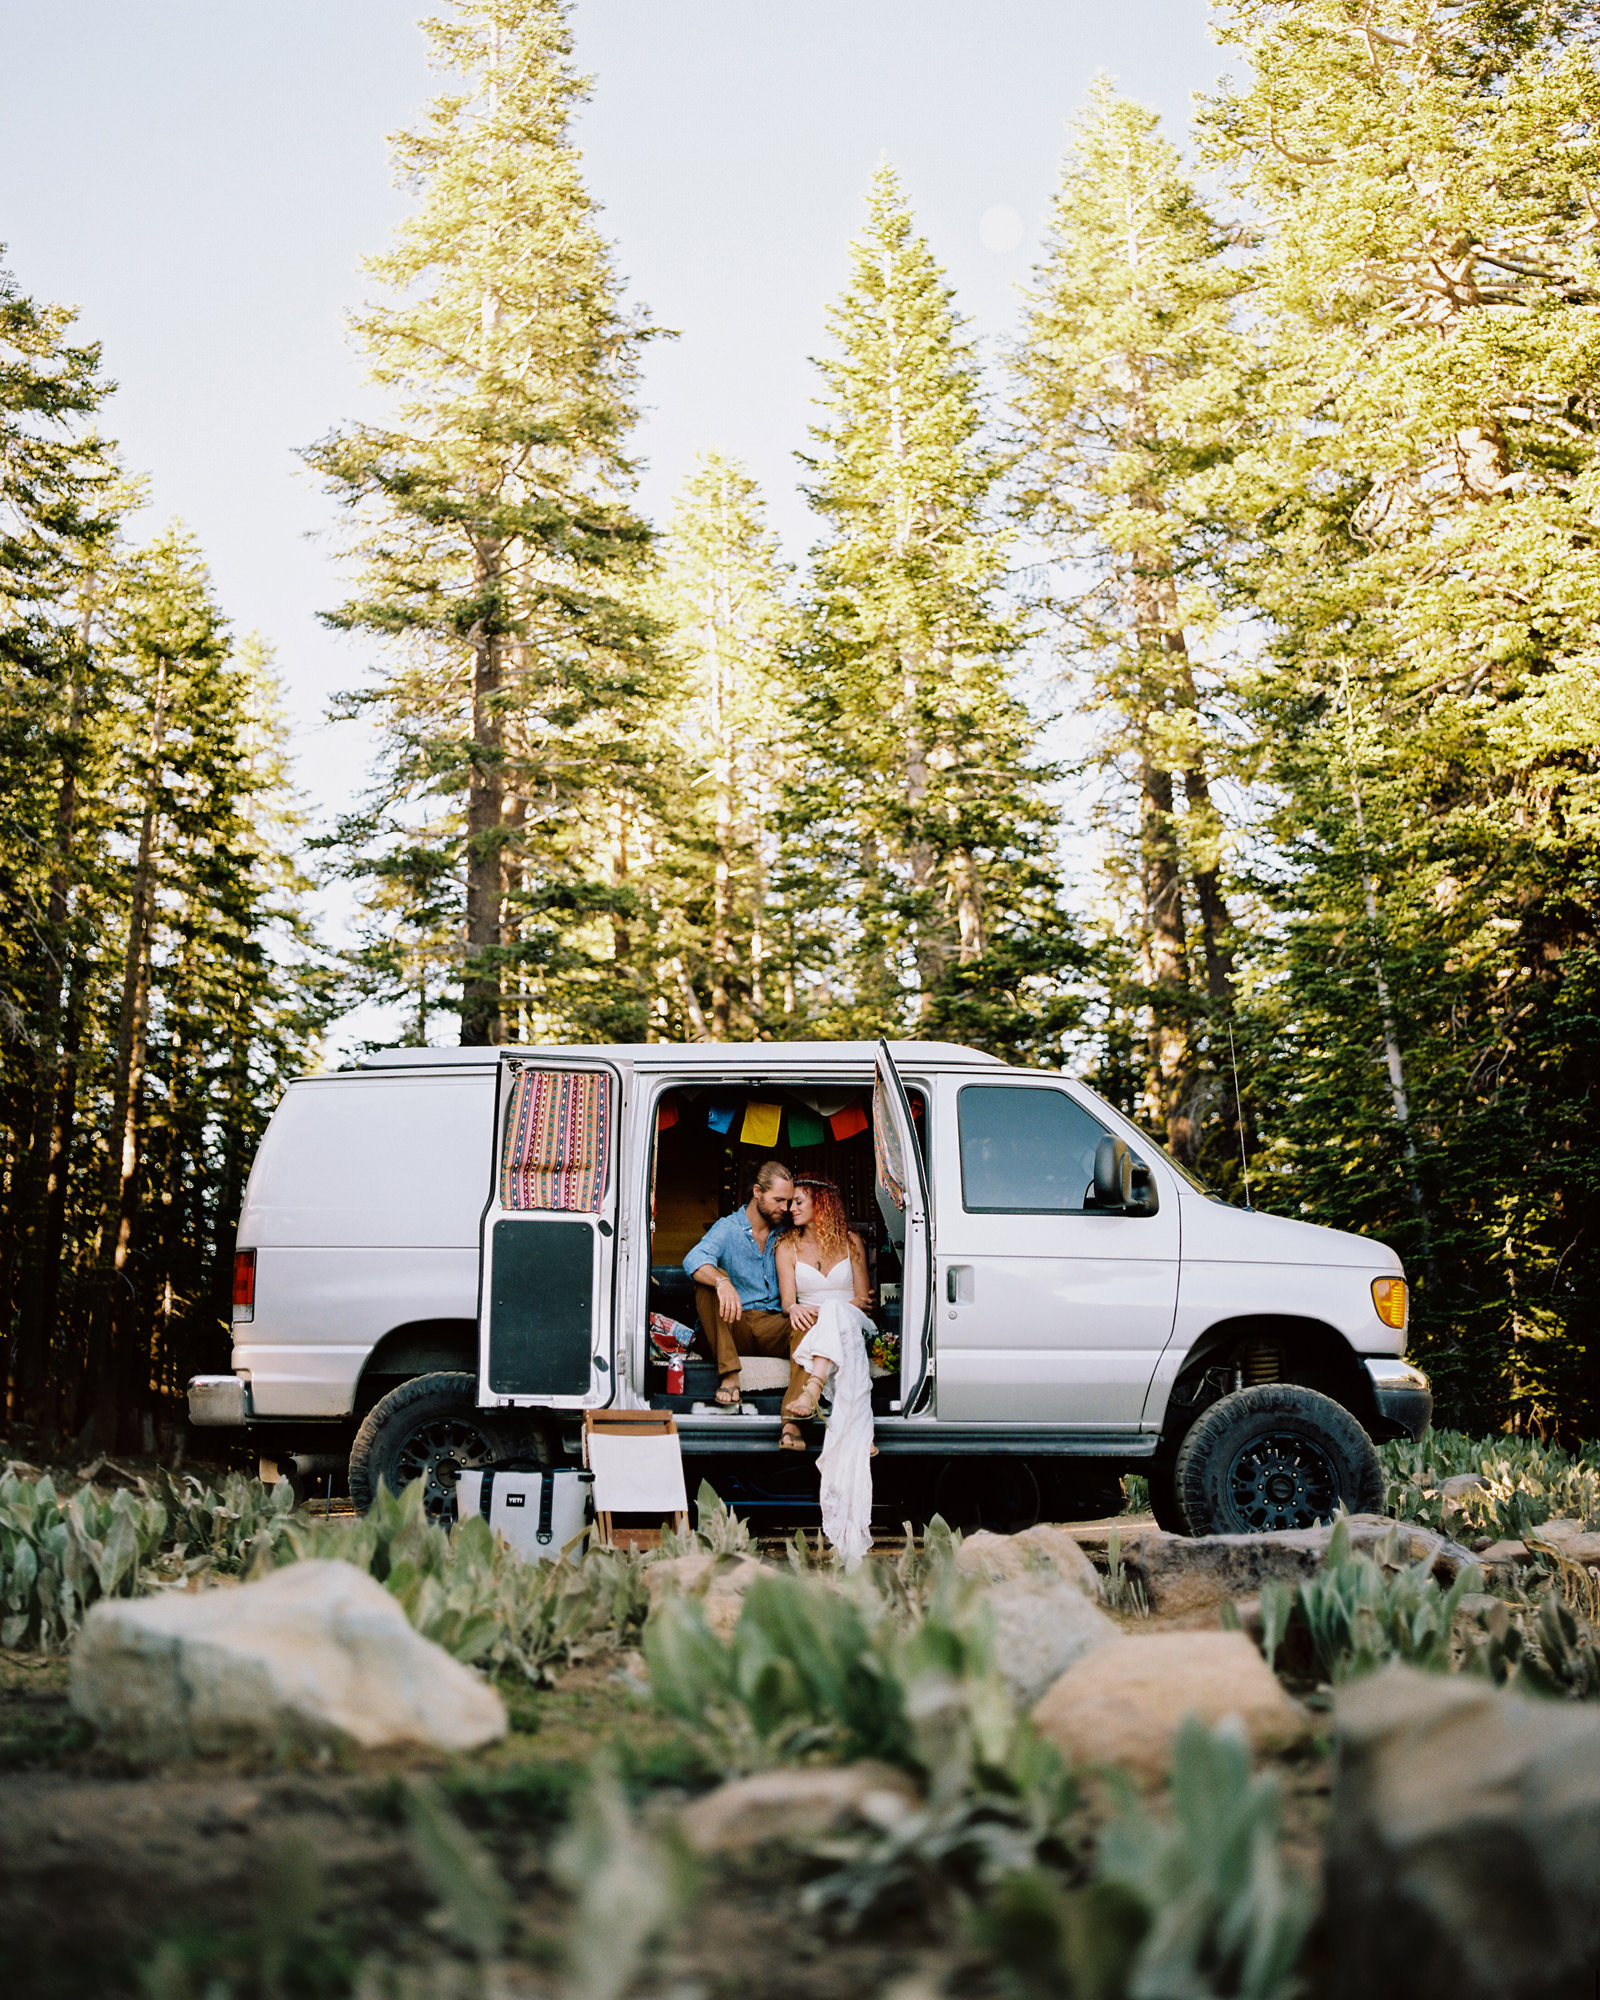 lake-tahoe-elopement-041 LAKE TAHOE ELOPEMENT